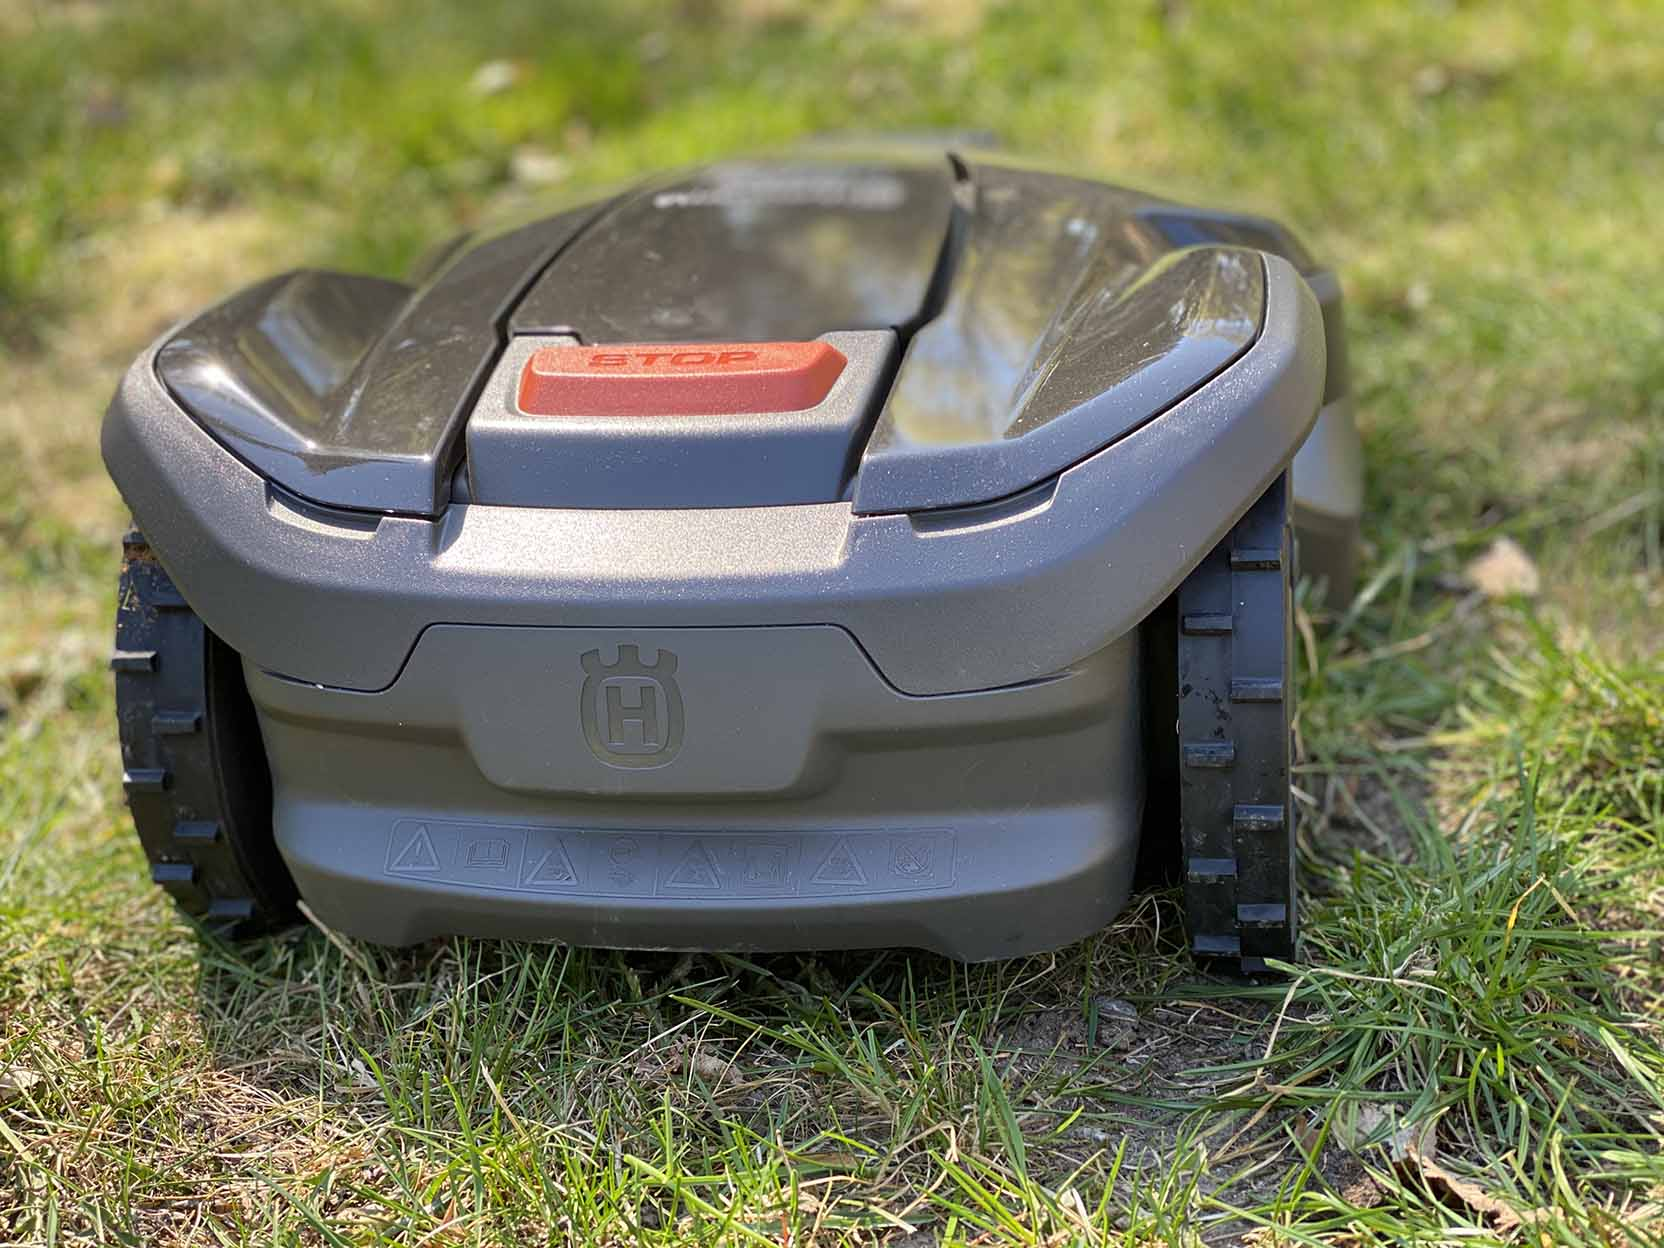 Husqvarna Automower 305 har ett spolsäkert chassi